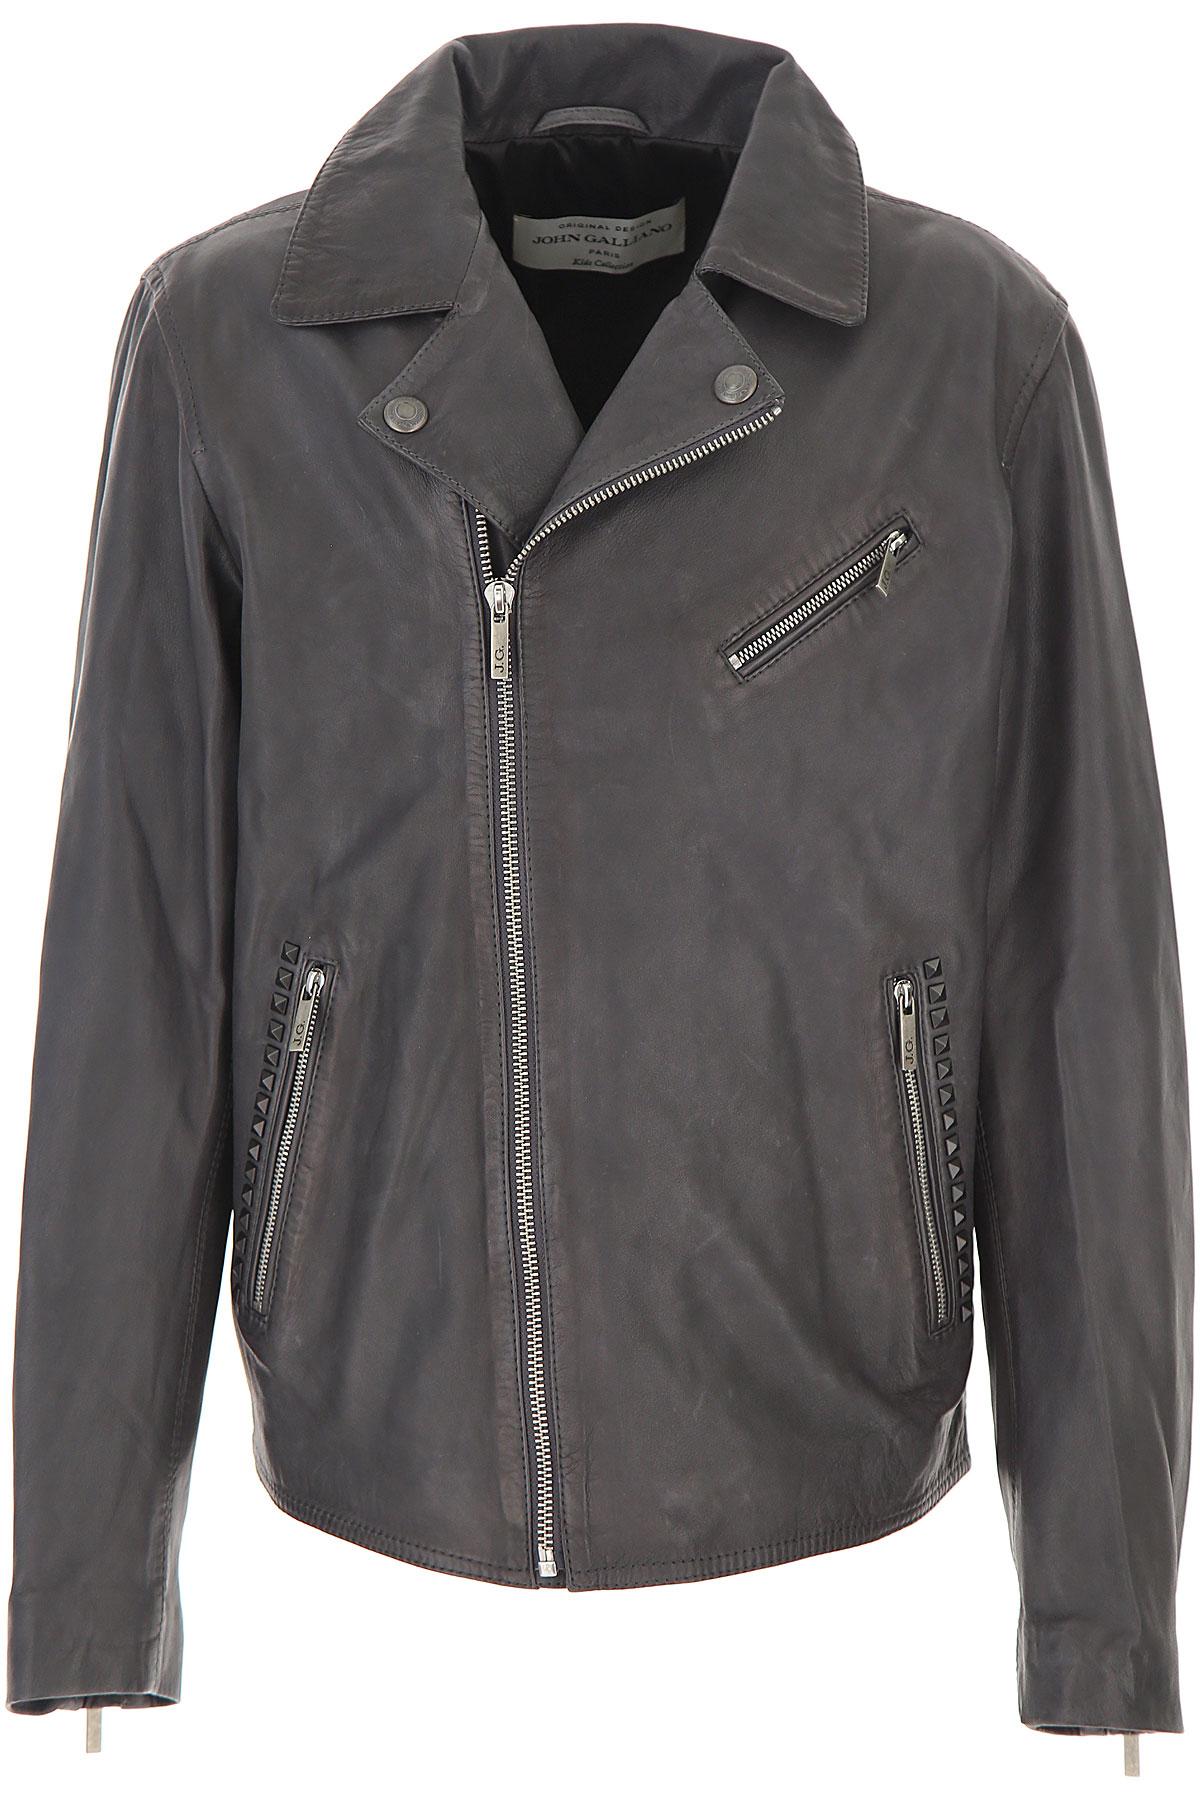 Galliano Kids Jacket for Boys On Sale, Dark Grey, Sheepskin Leather, 2019, 12Y 14Y